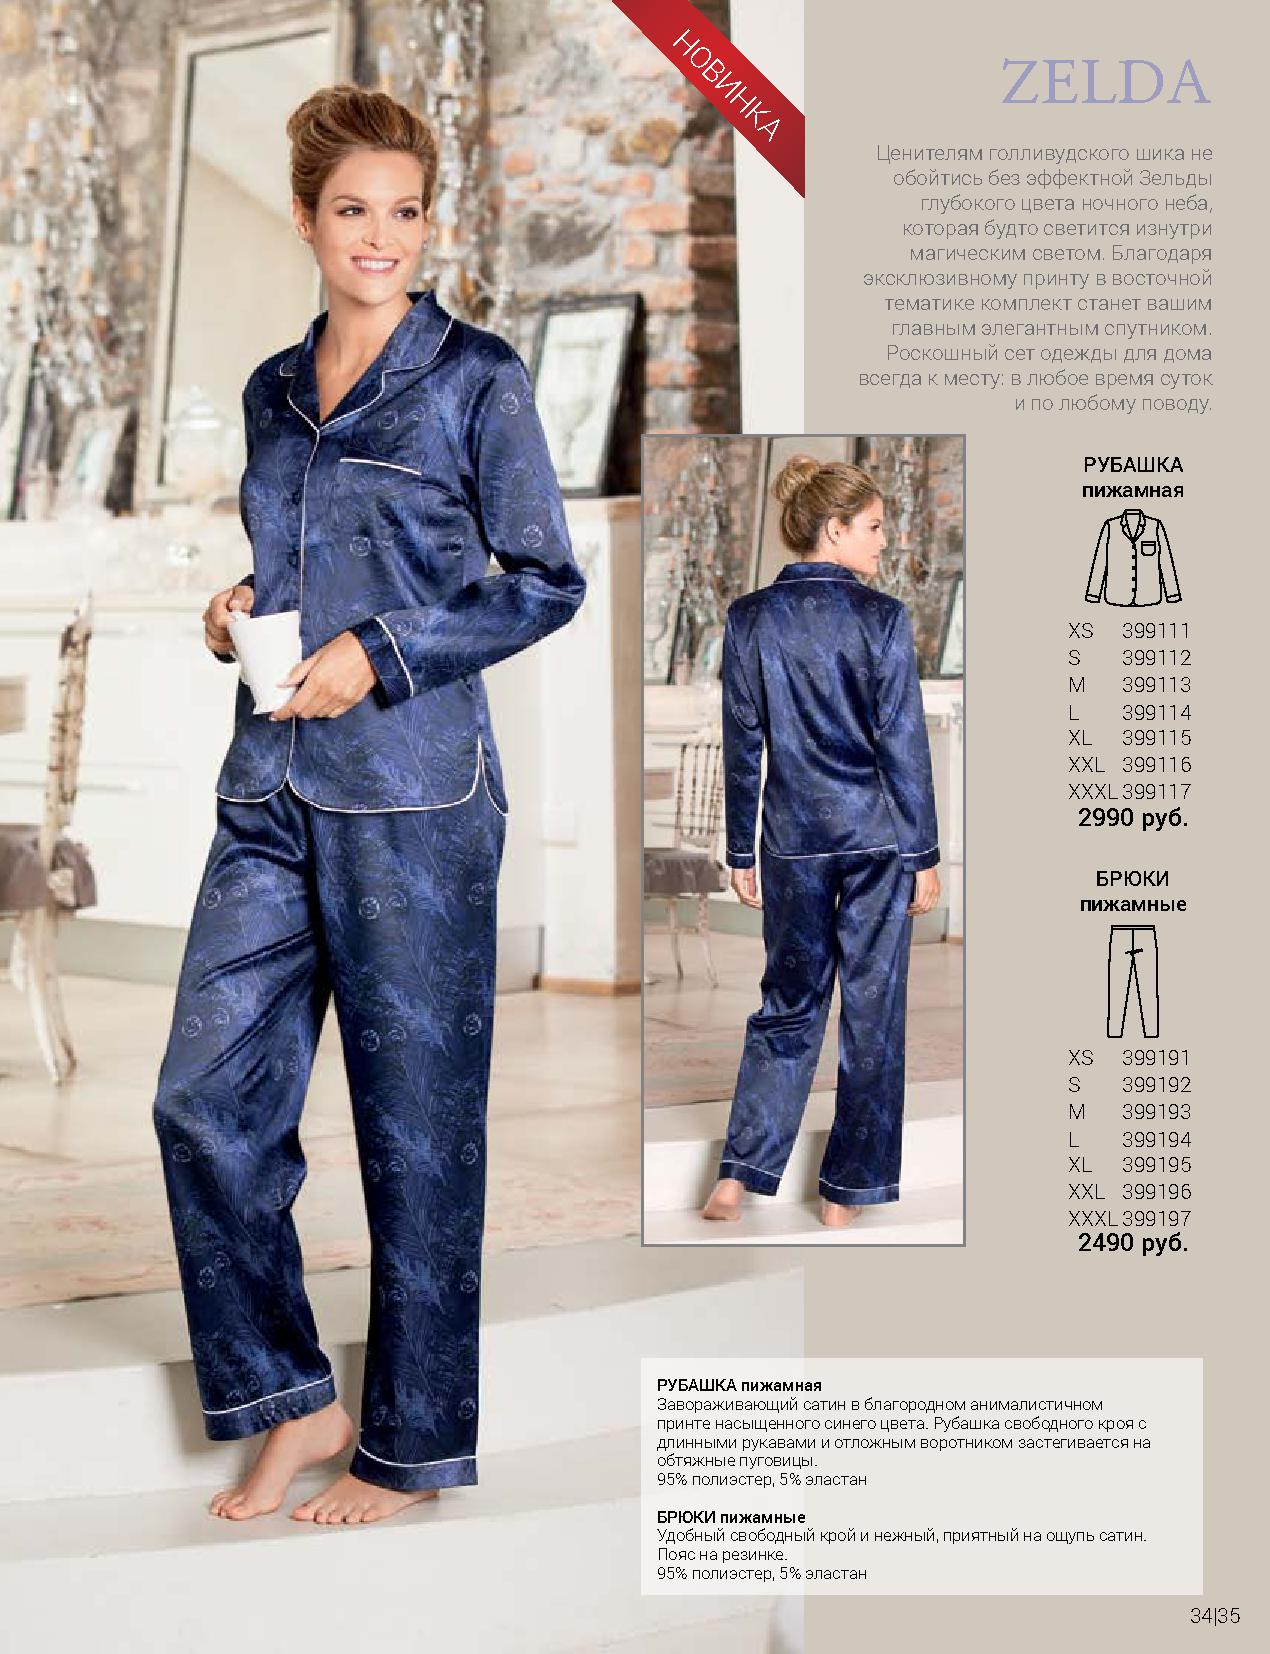 Флоранж - комплект Зельда - рубашка и брюки